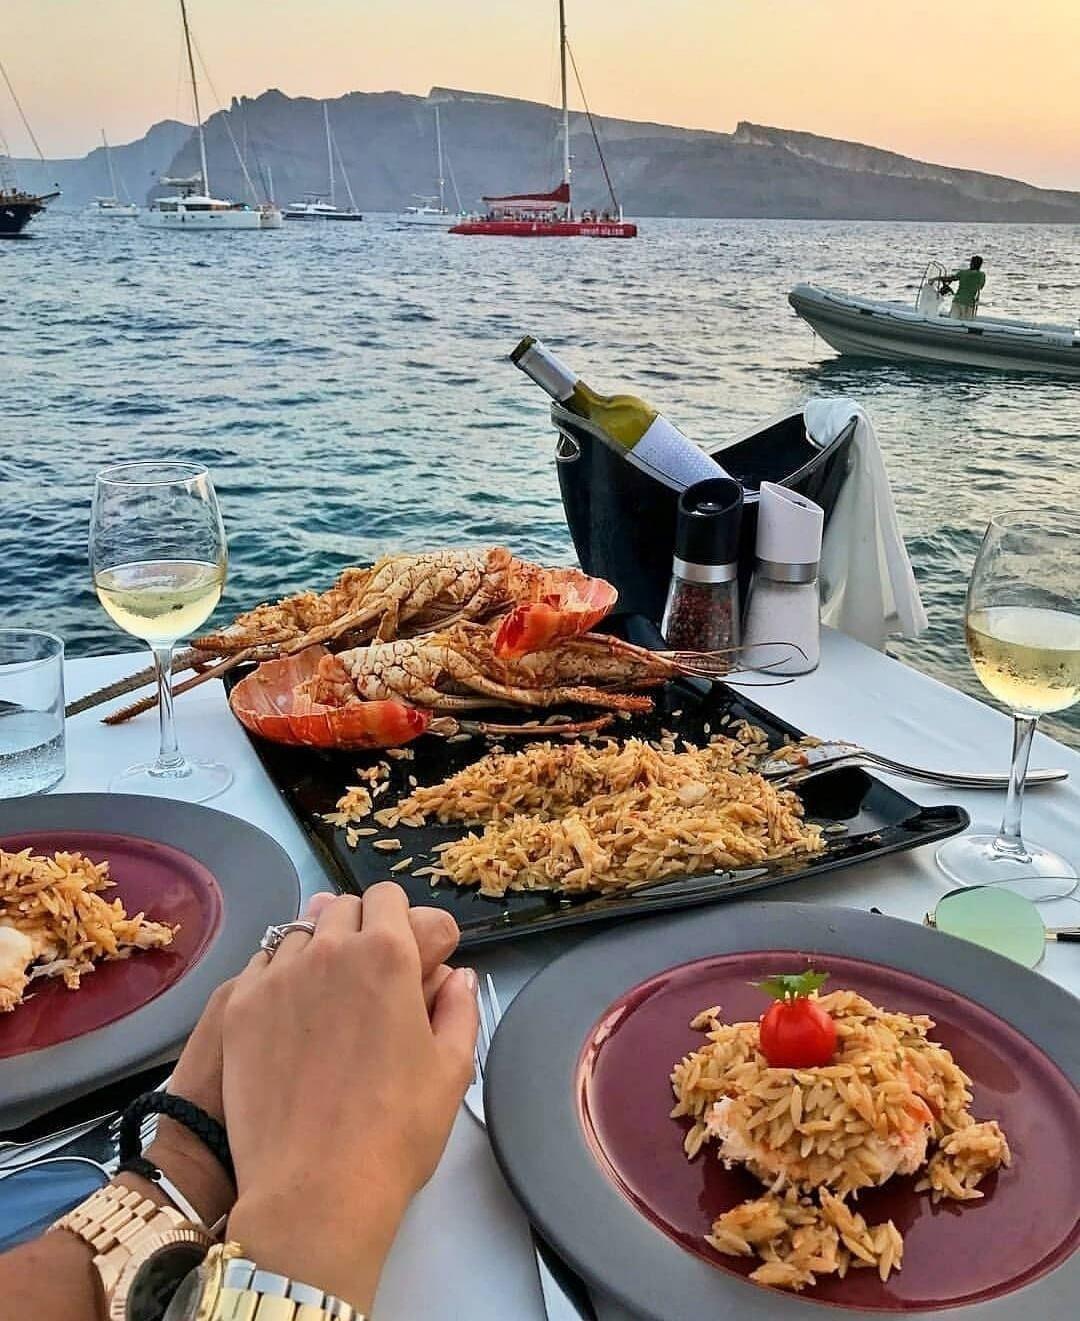 ammoudi_santorini via instagram #uploads#personal#travel#inspo#location#destination#vacation#lifestyle#goals